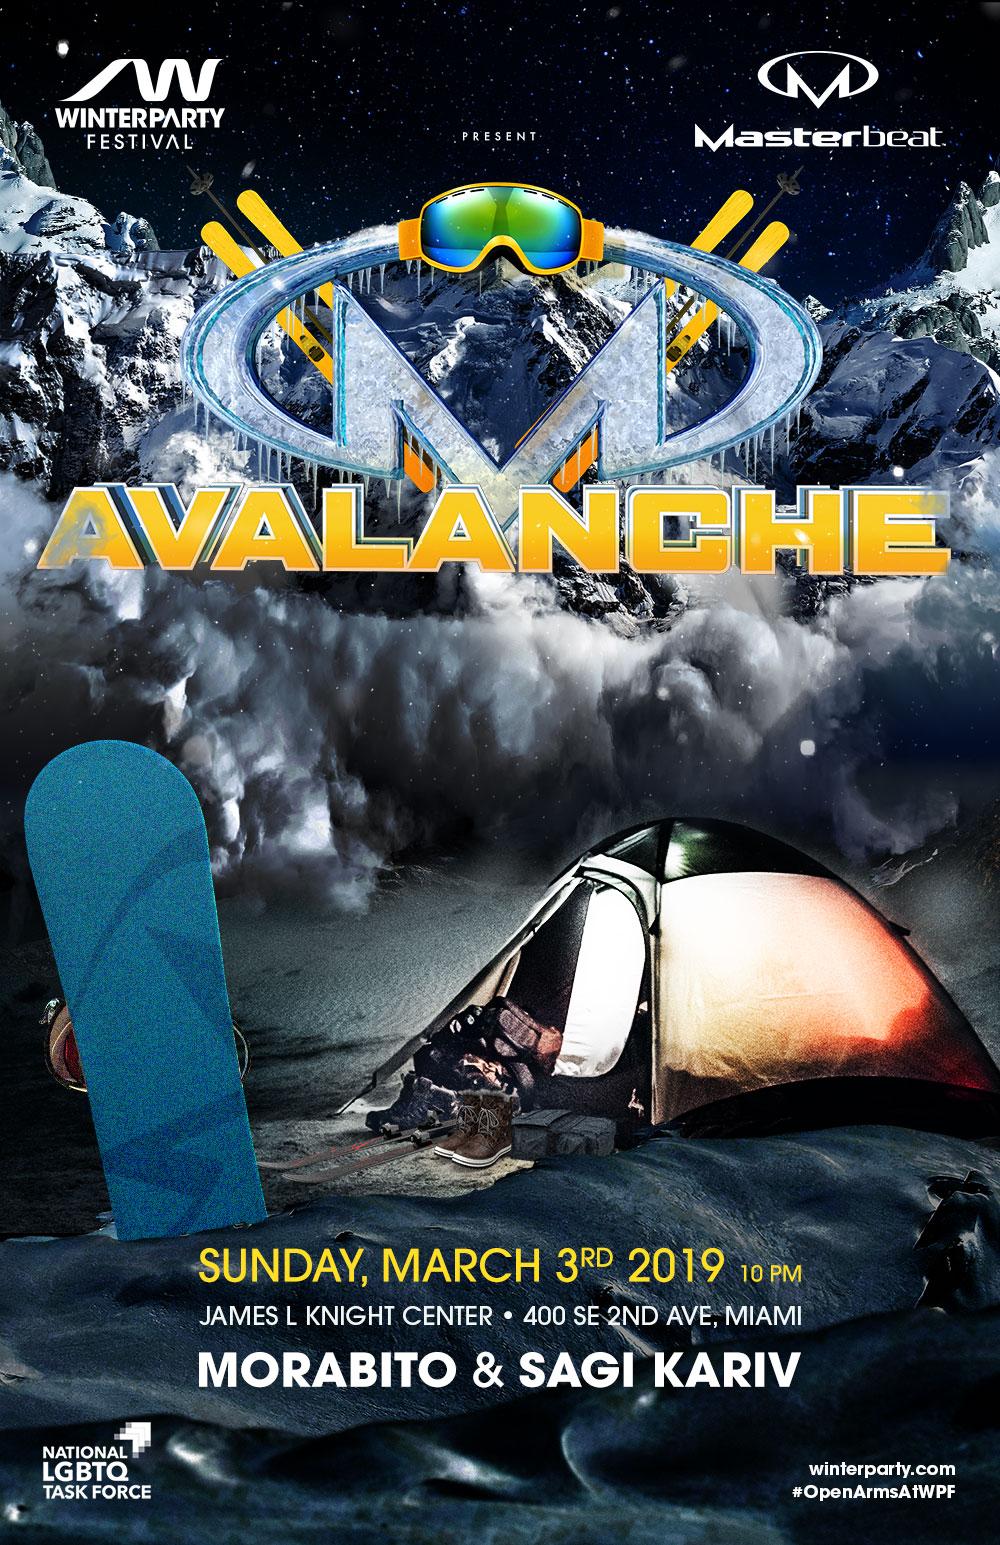 Masterbeat Avalanche